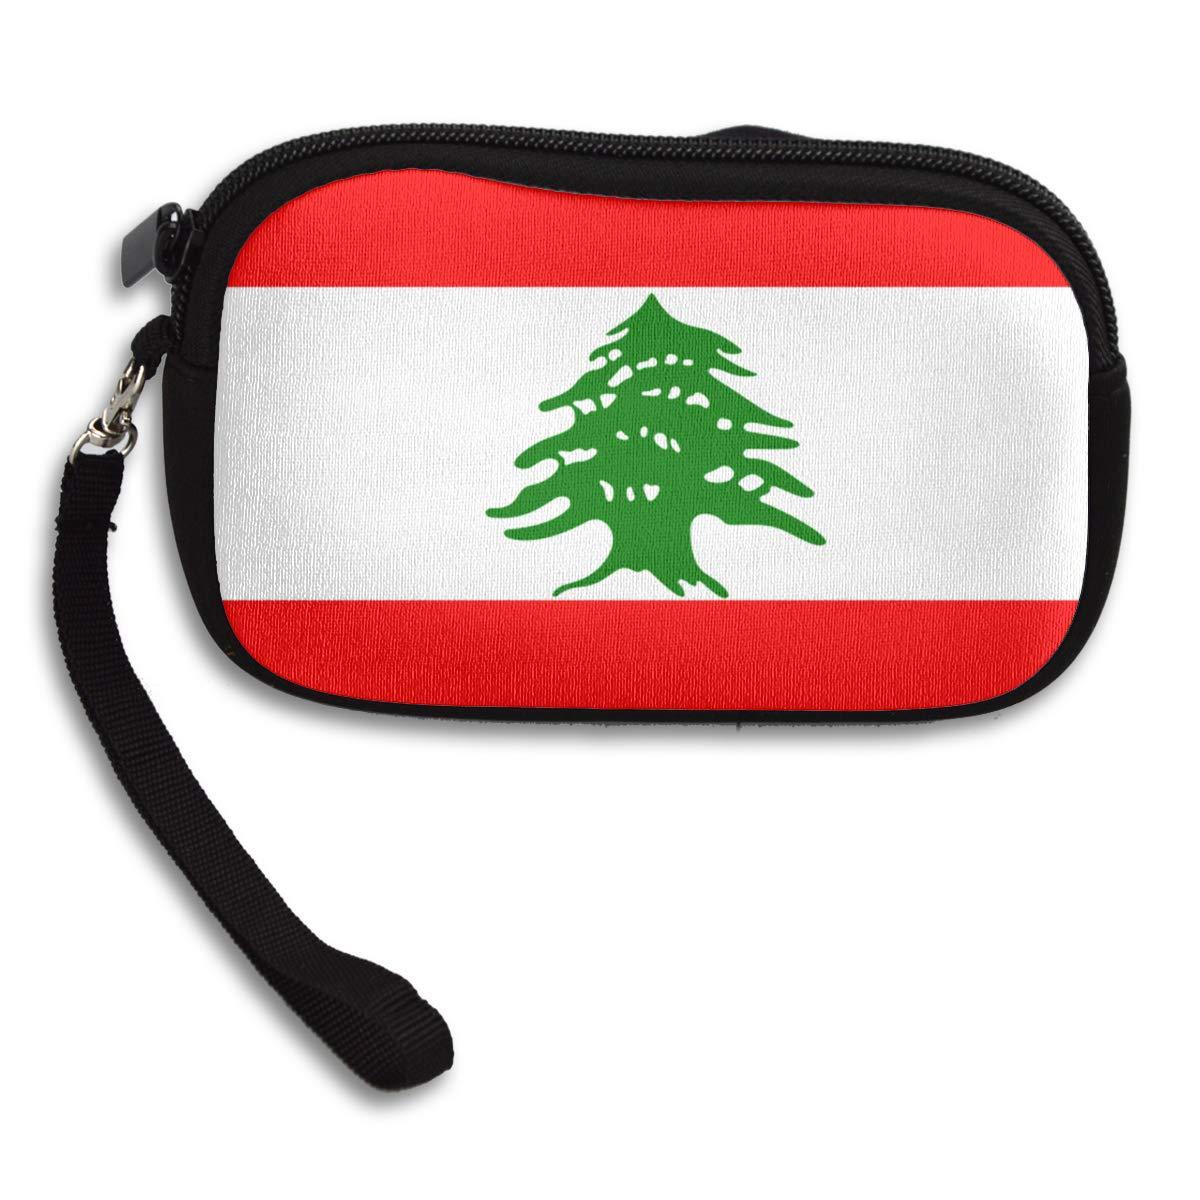 Lebanon Flag Coin Purse Cute Change Purse,Make Up Bag,Cellphone Bag With Handle Purses For Women